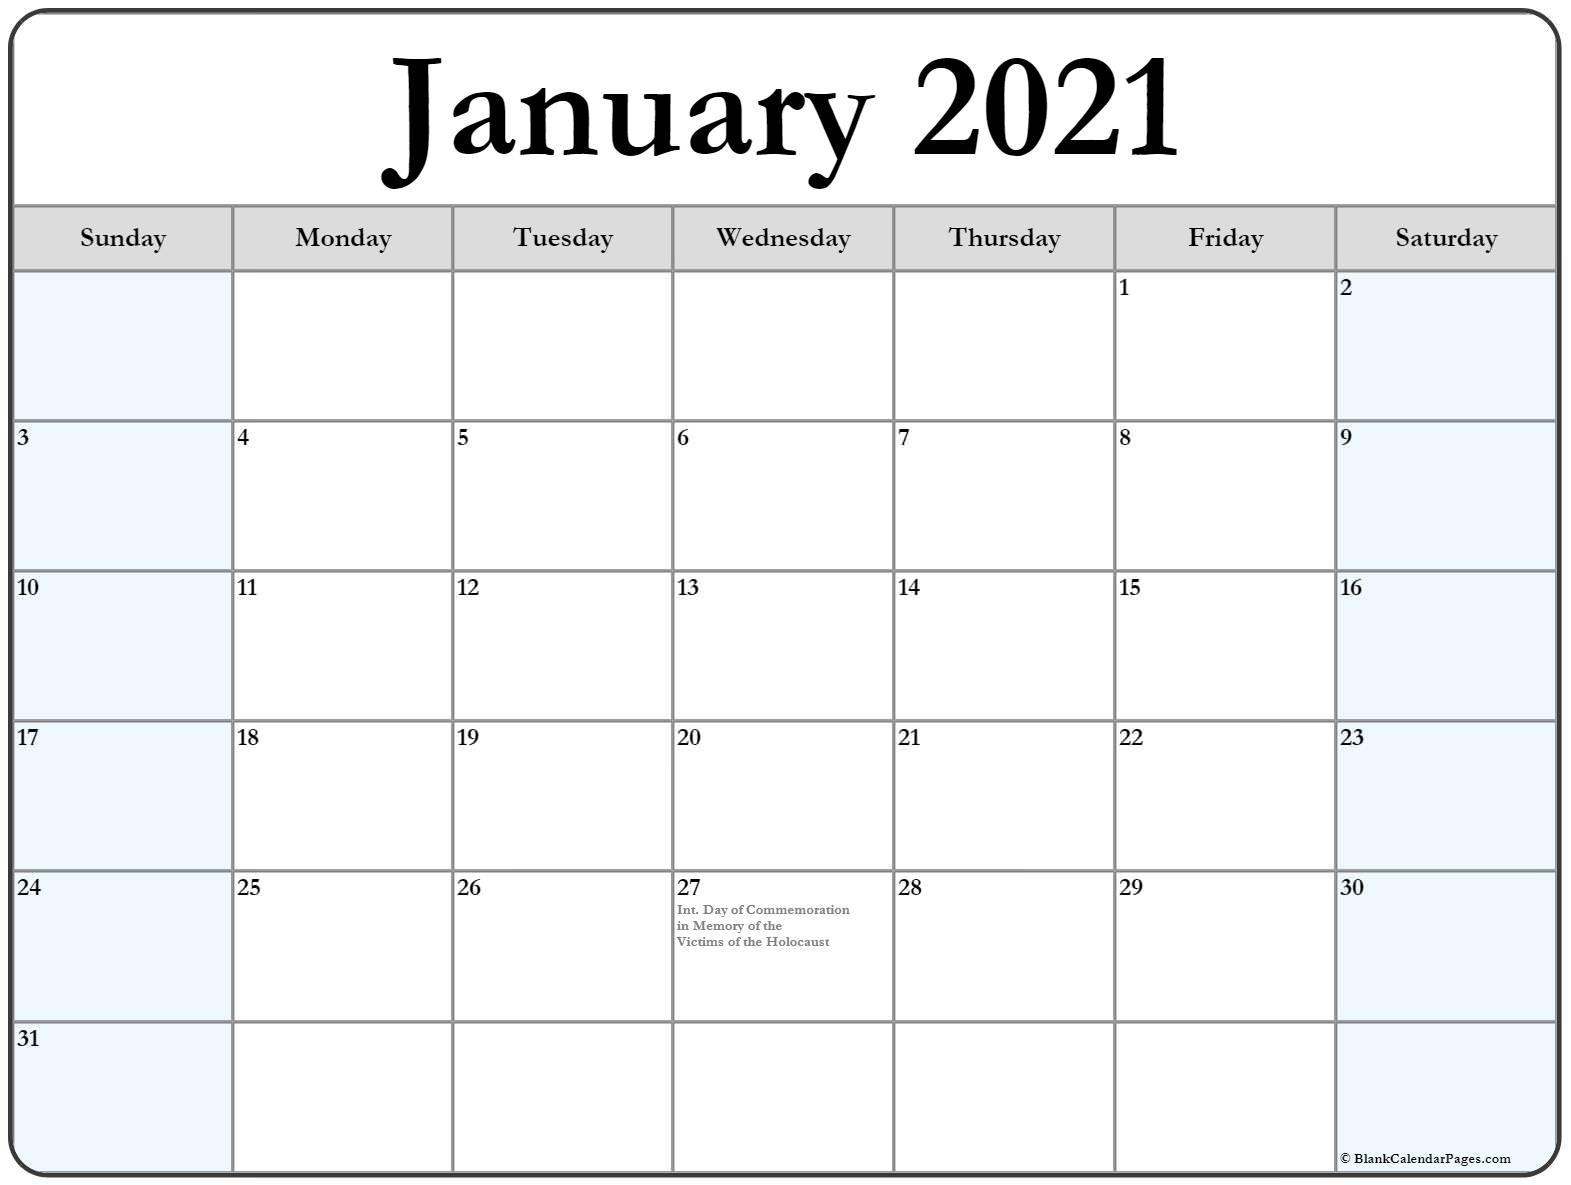 January 2021 With Holidays Calendar